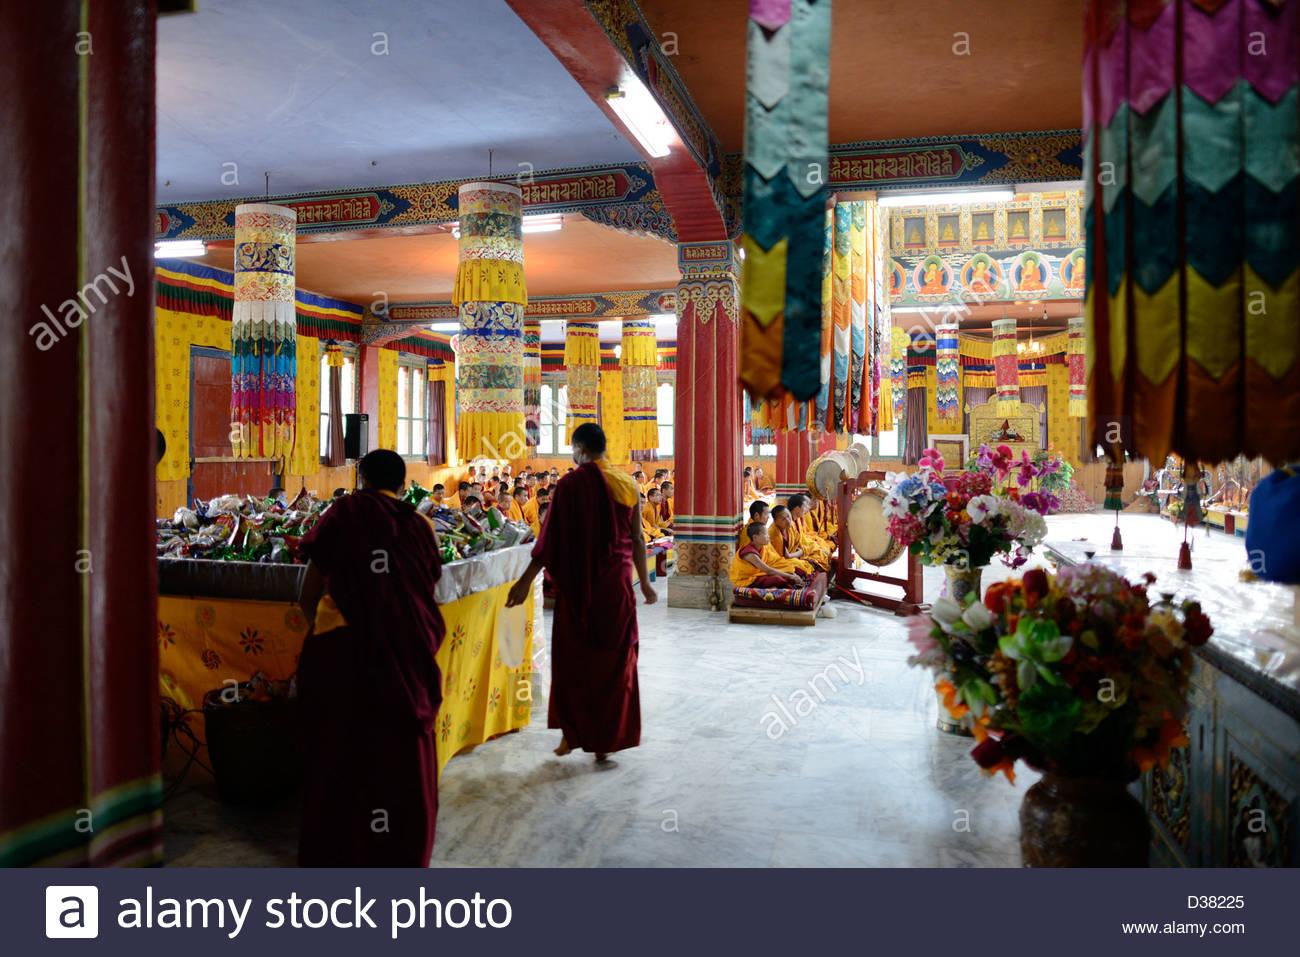 Monks on last day of nine days of prayers/chants for world peace,Namke Nyingpo Goemba a monastery in jakar,Bumthang,Bhutan,36MPX - Stock Image